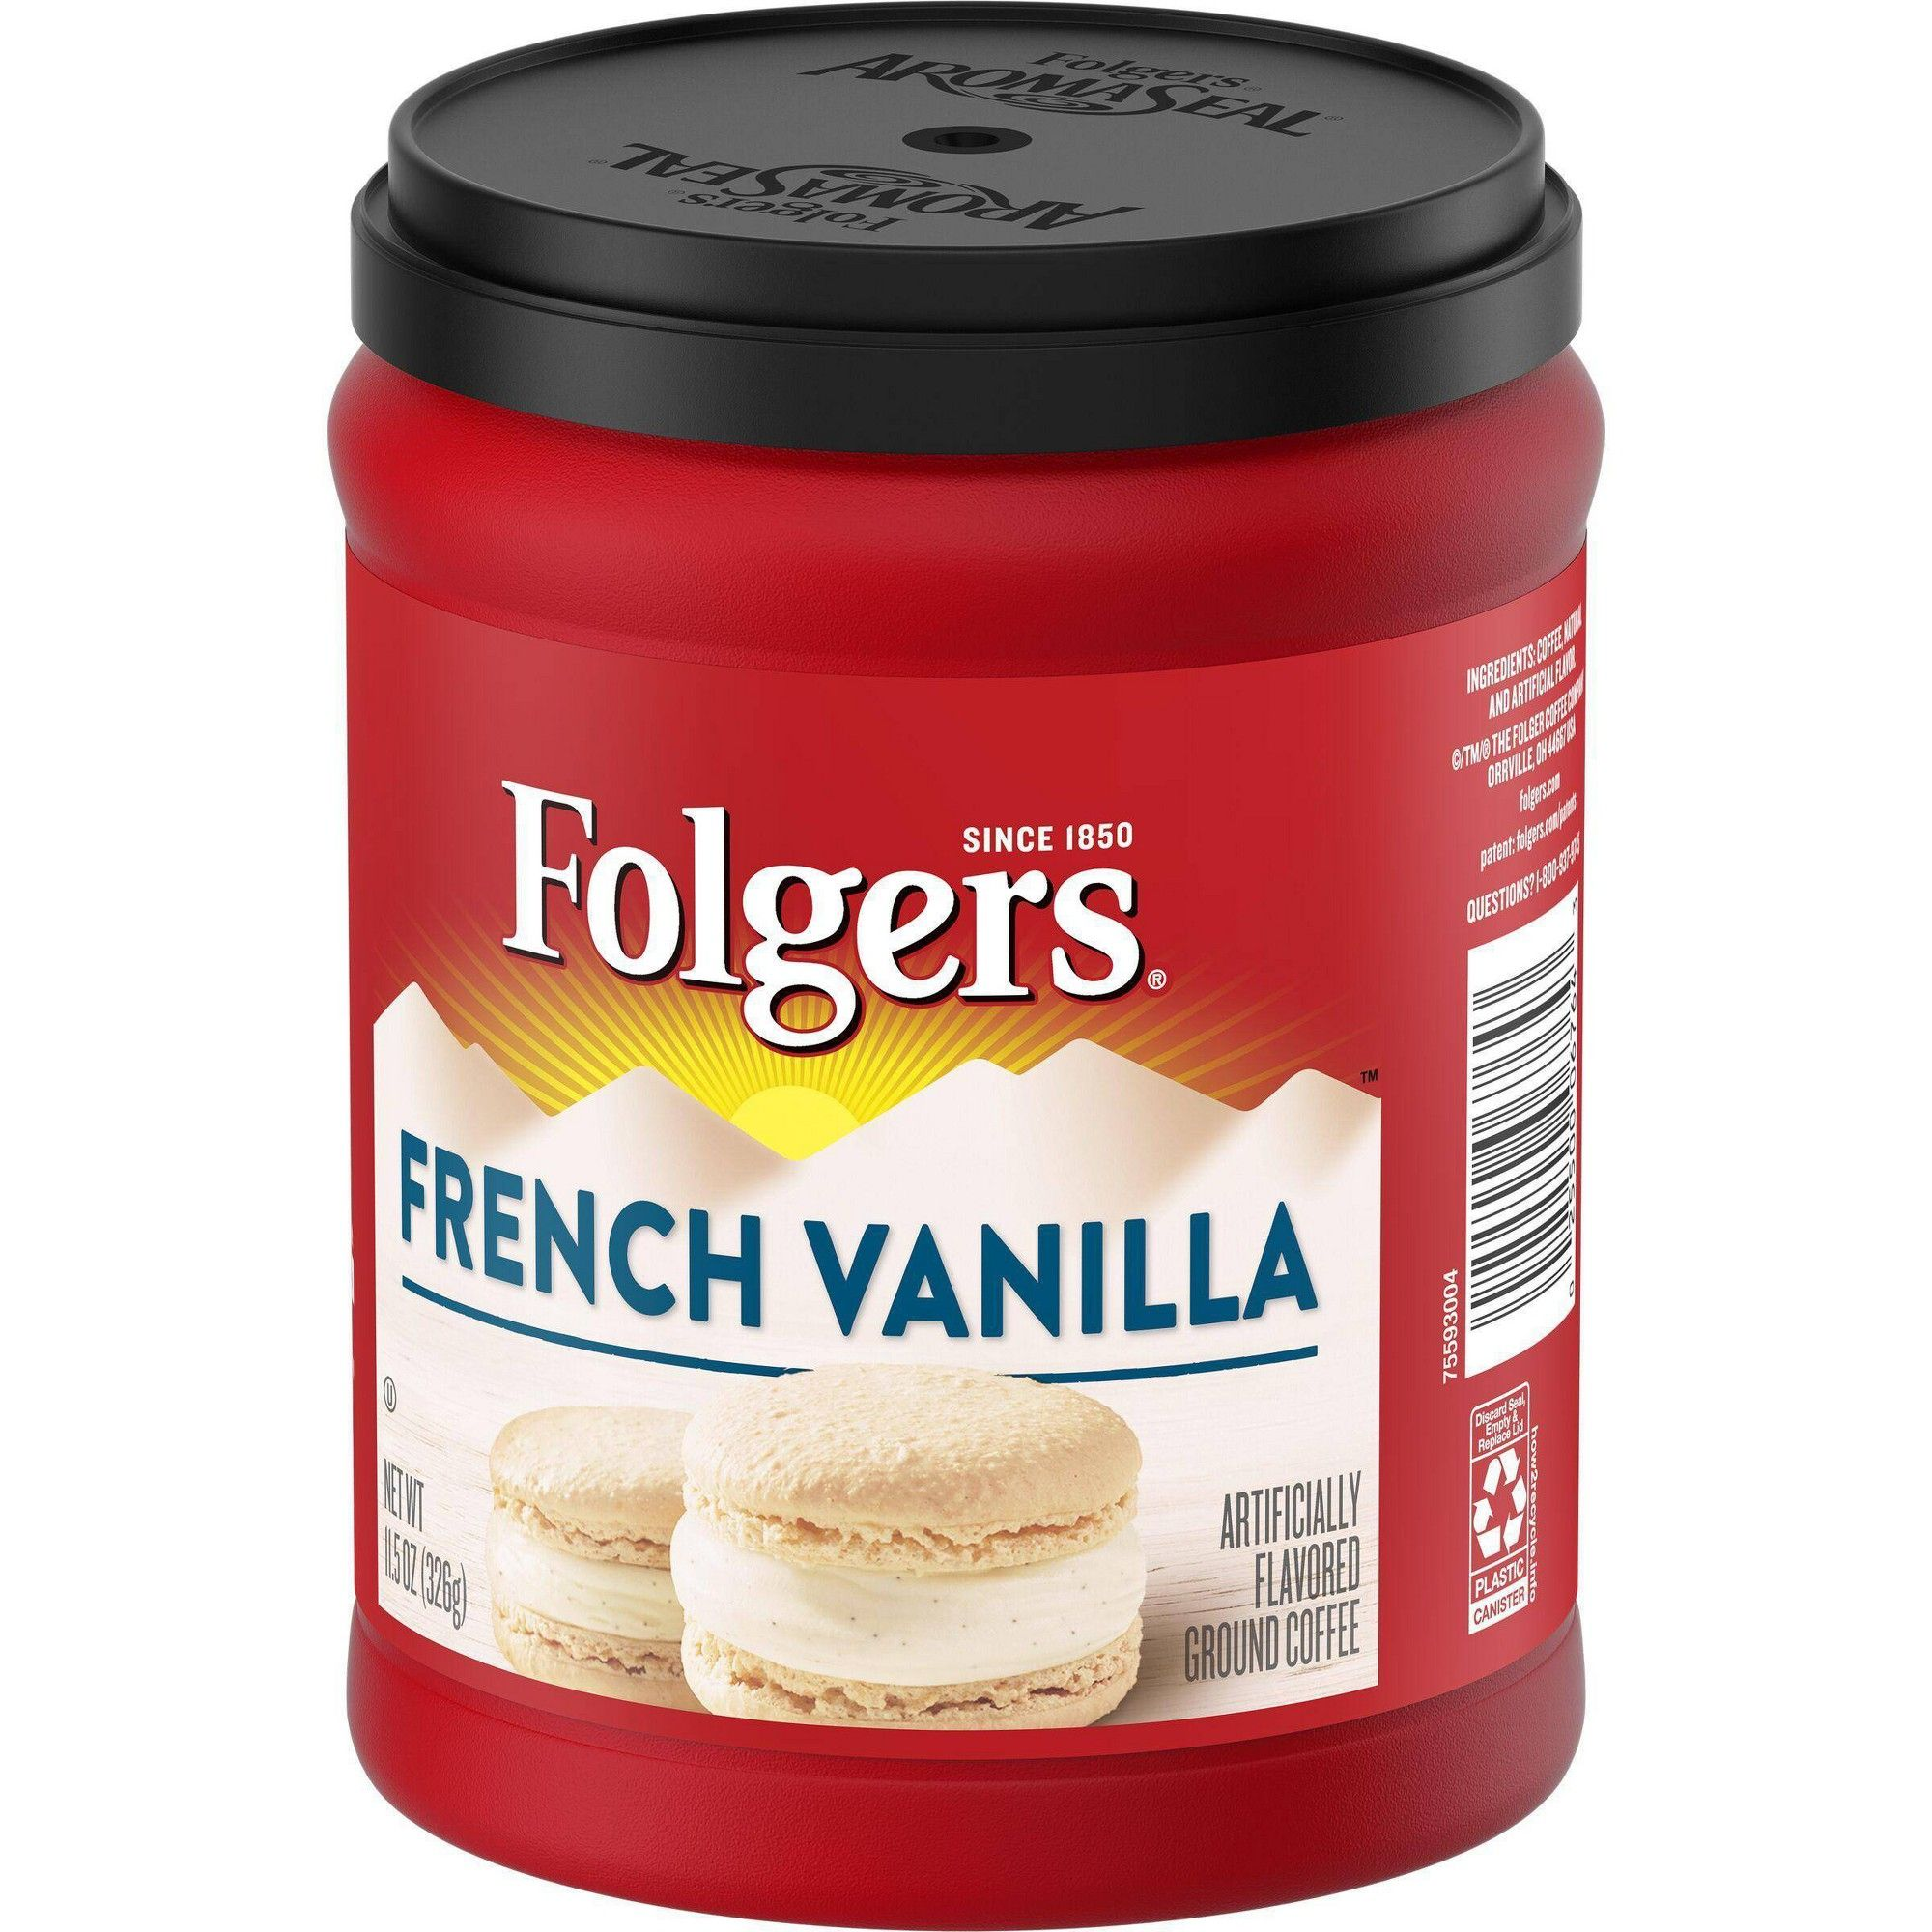 Folgers flavors french vanilla mountain grown medium roast